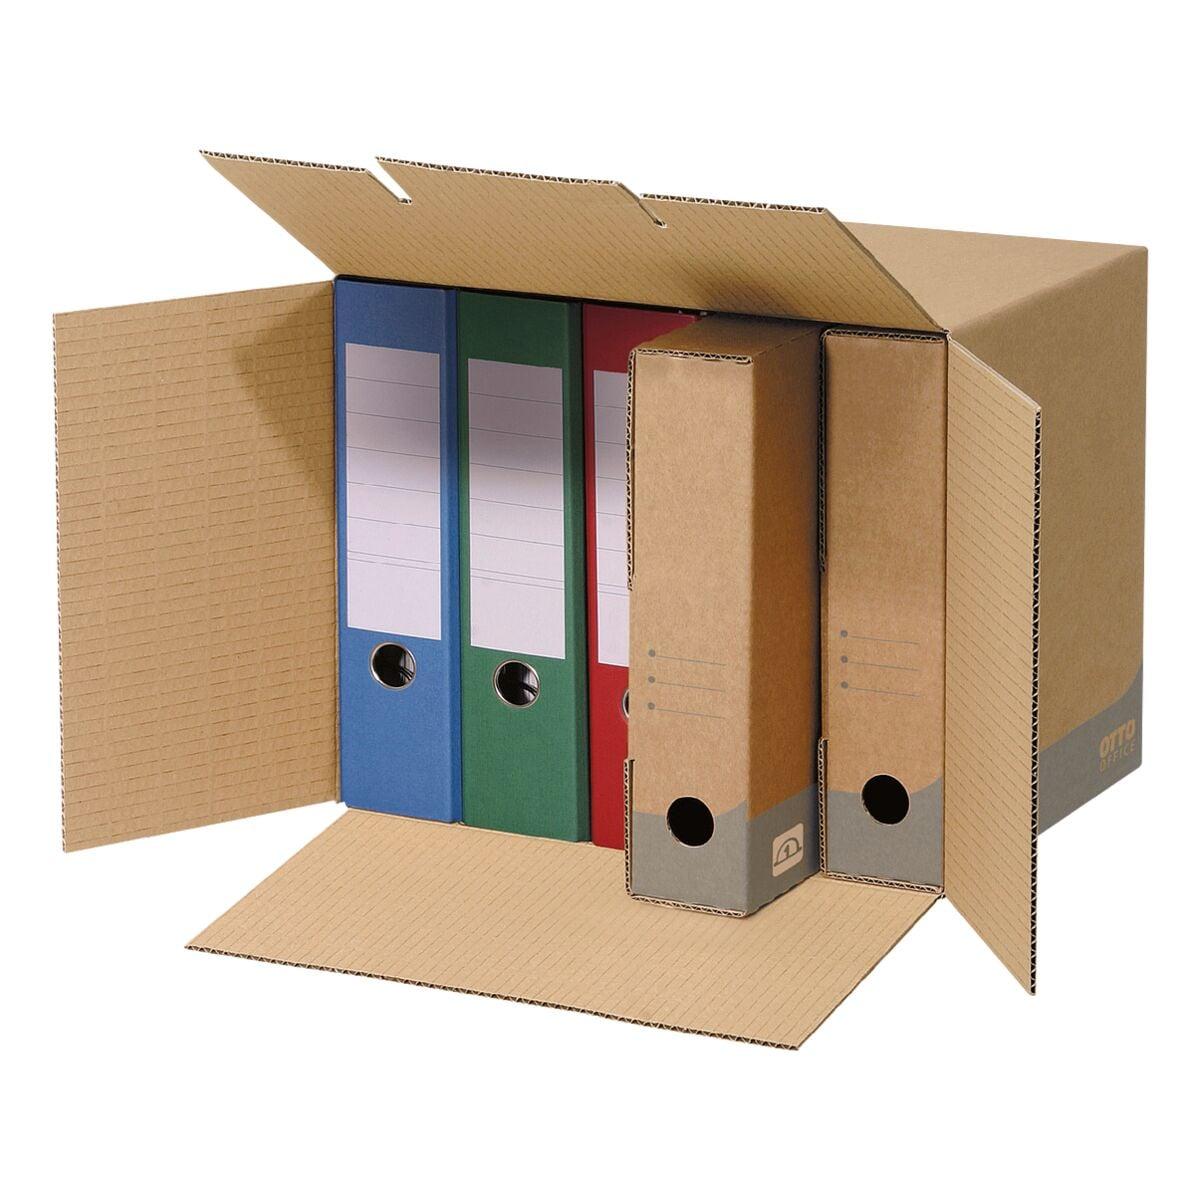 otto office budget 10er pack ablage container bei otto office g nstig kaufen. Black Bedroom Furniture Sets. Home Design Ideas